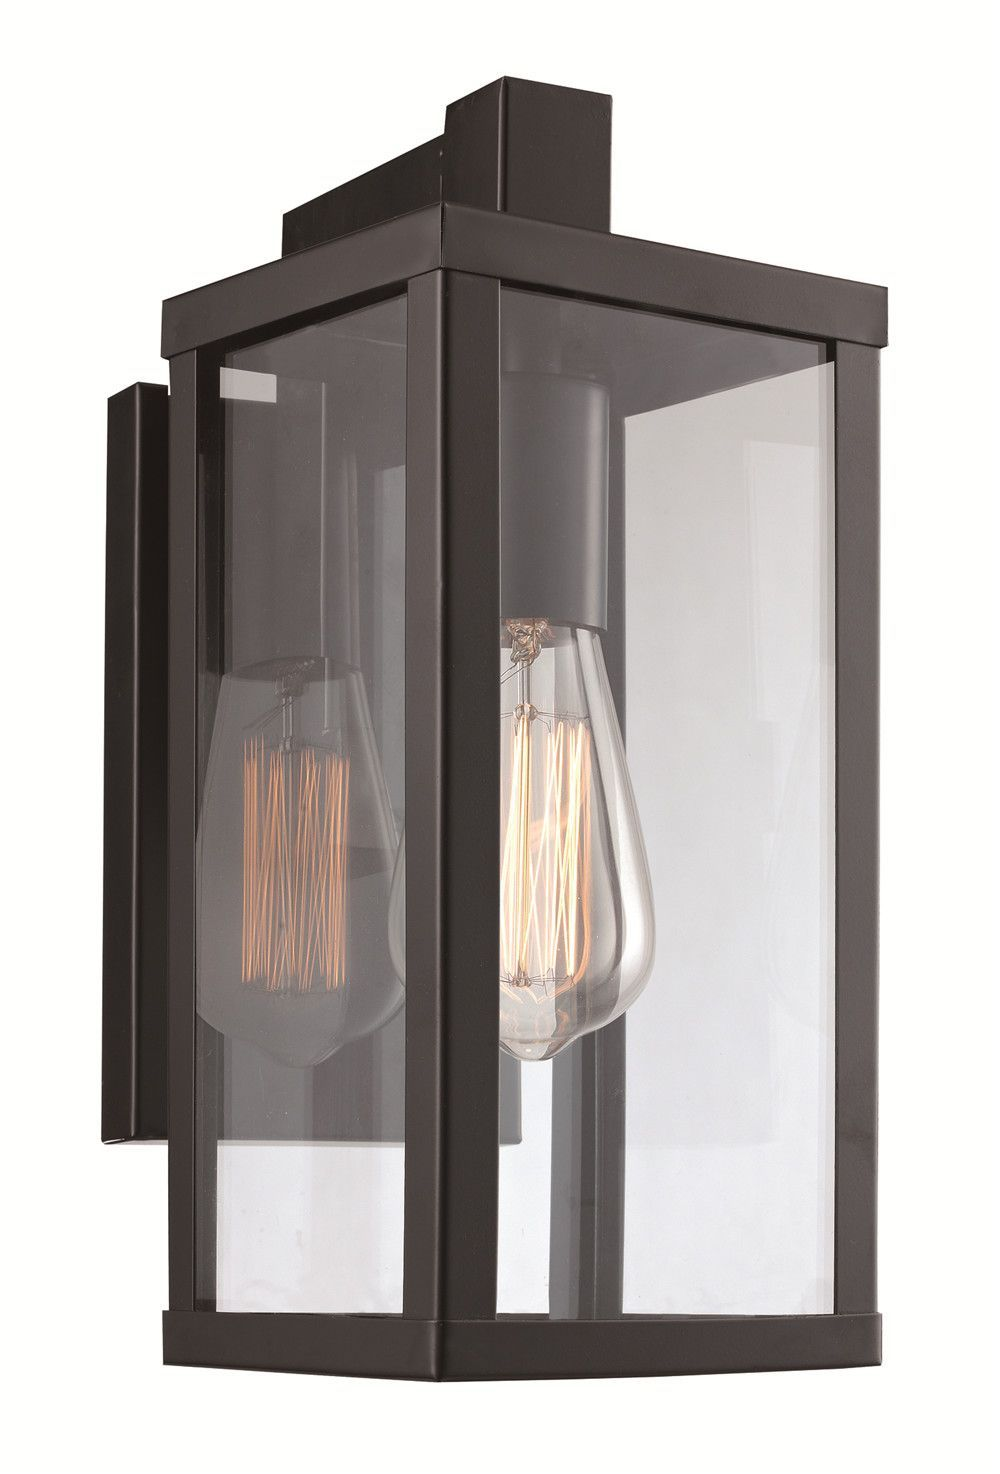 light wall lantern  outdoor lights  pinterest  wall lantern  - find this pin and more on outdoor lights by carisaklassen